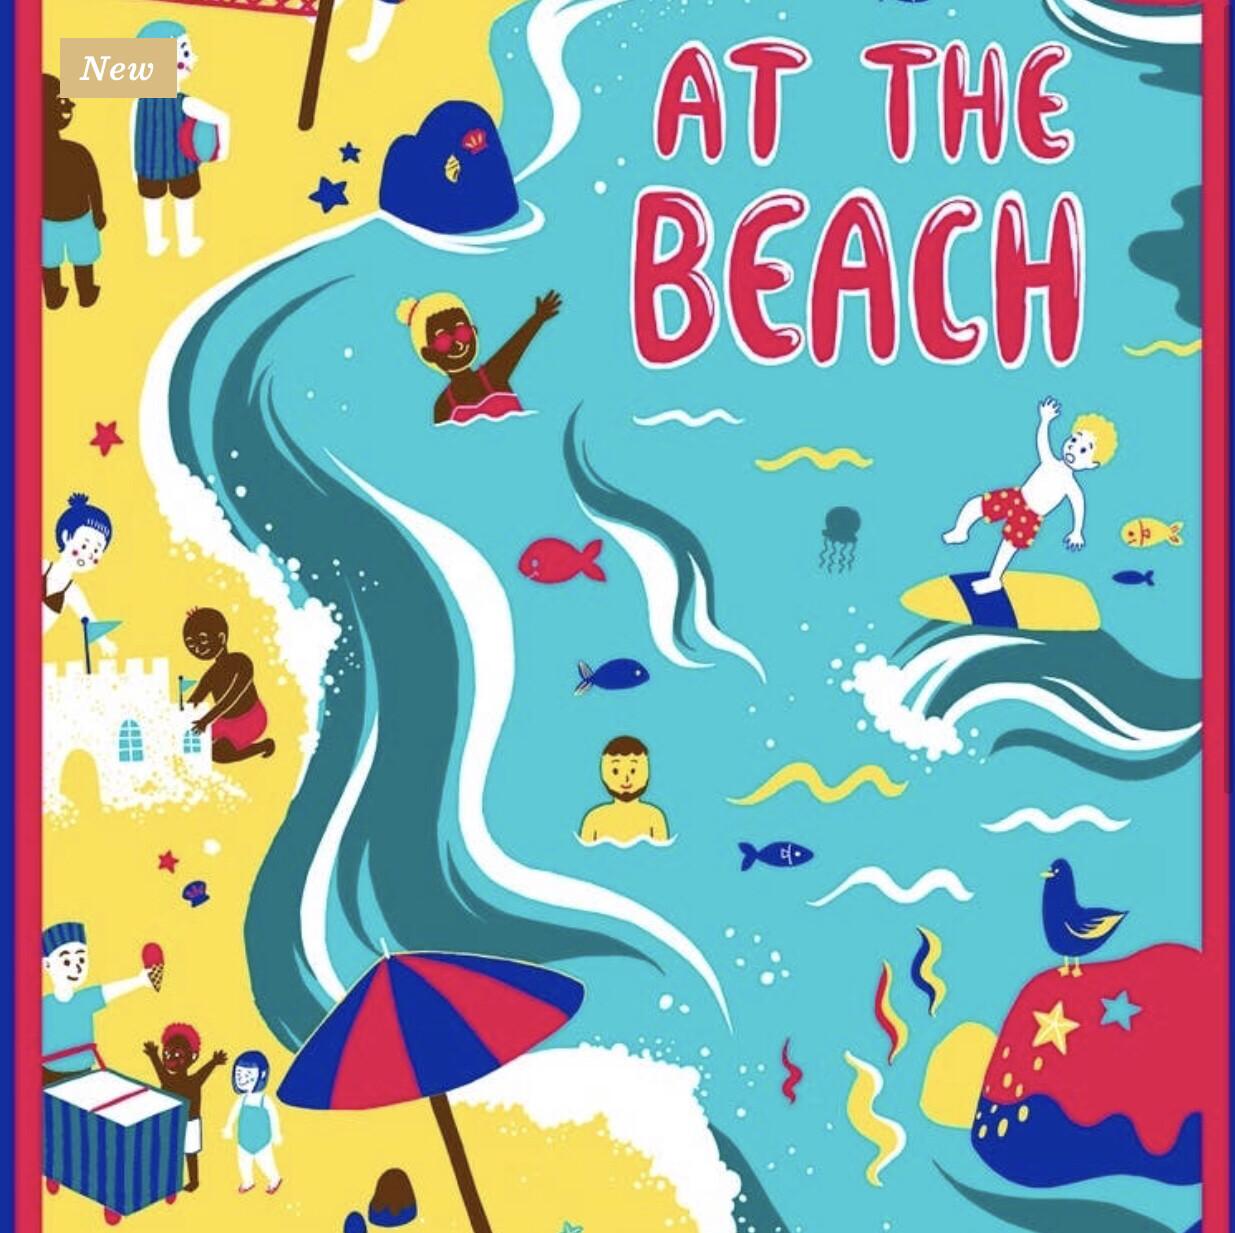 At The Beach Towel